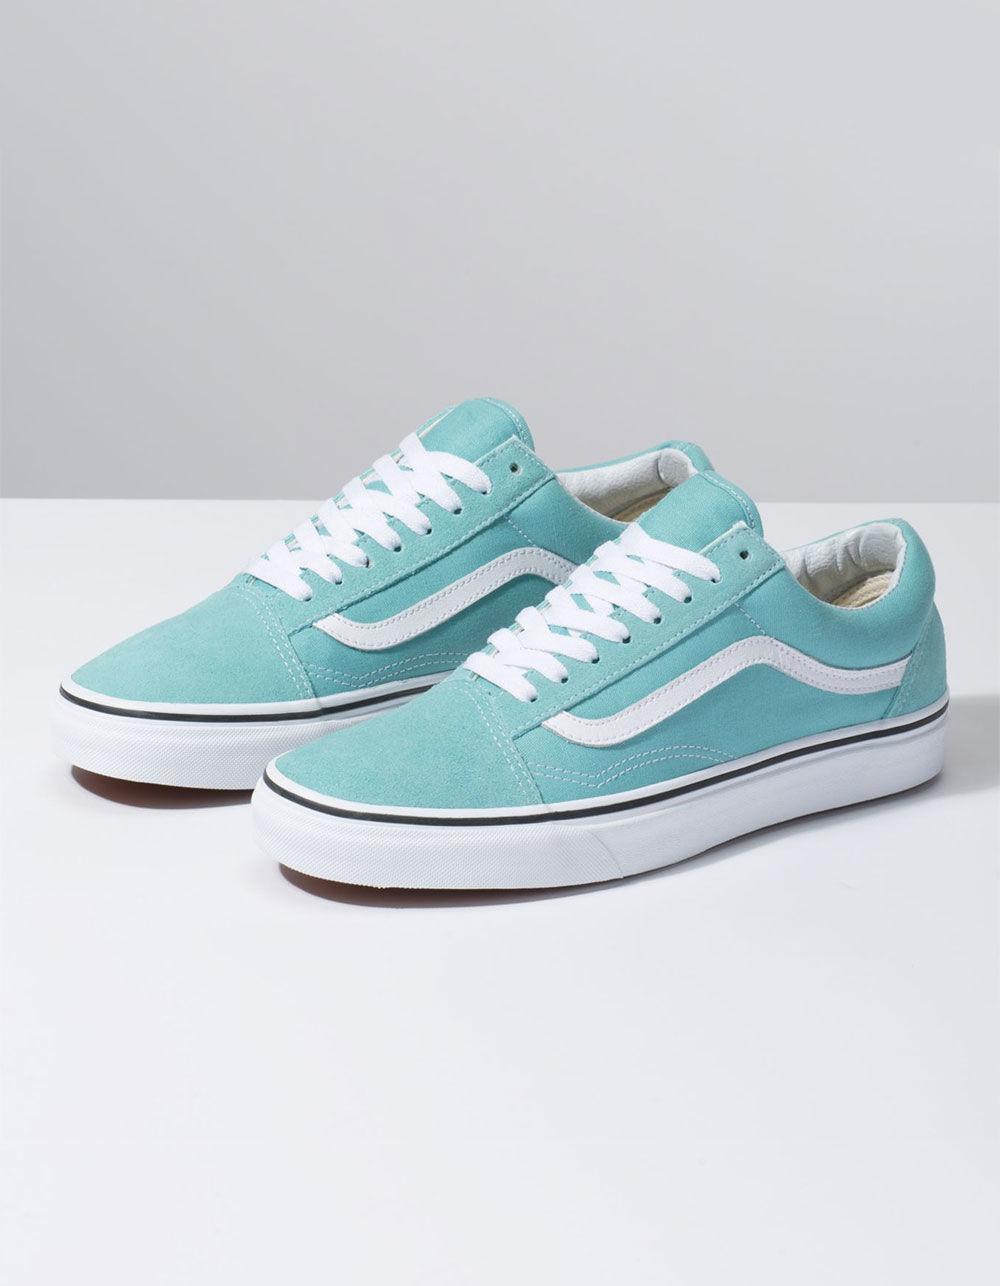 87037855ee Vans - Multicolor Old Skool Aqua Haze   True White Shoes - Lyst. View  fullscreen